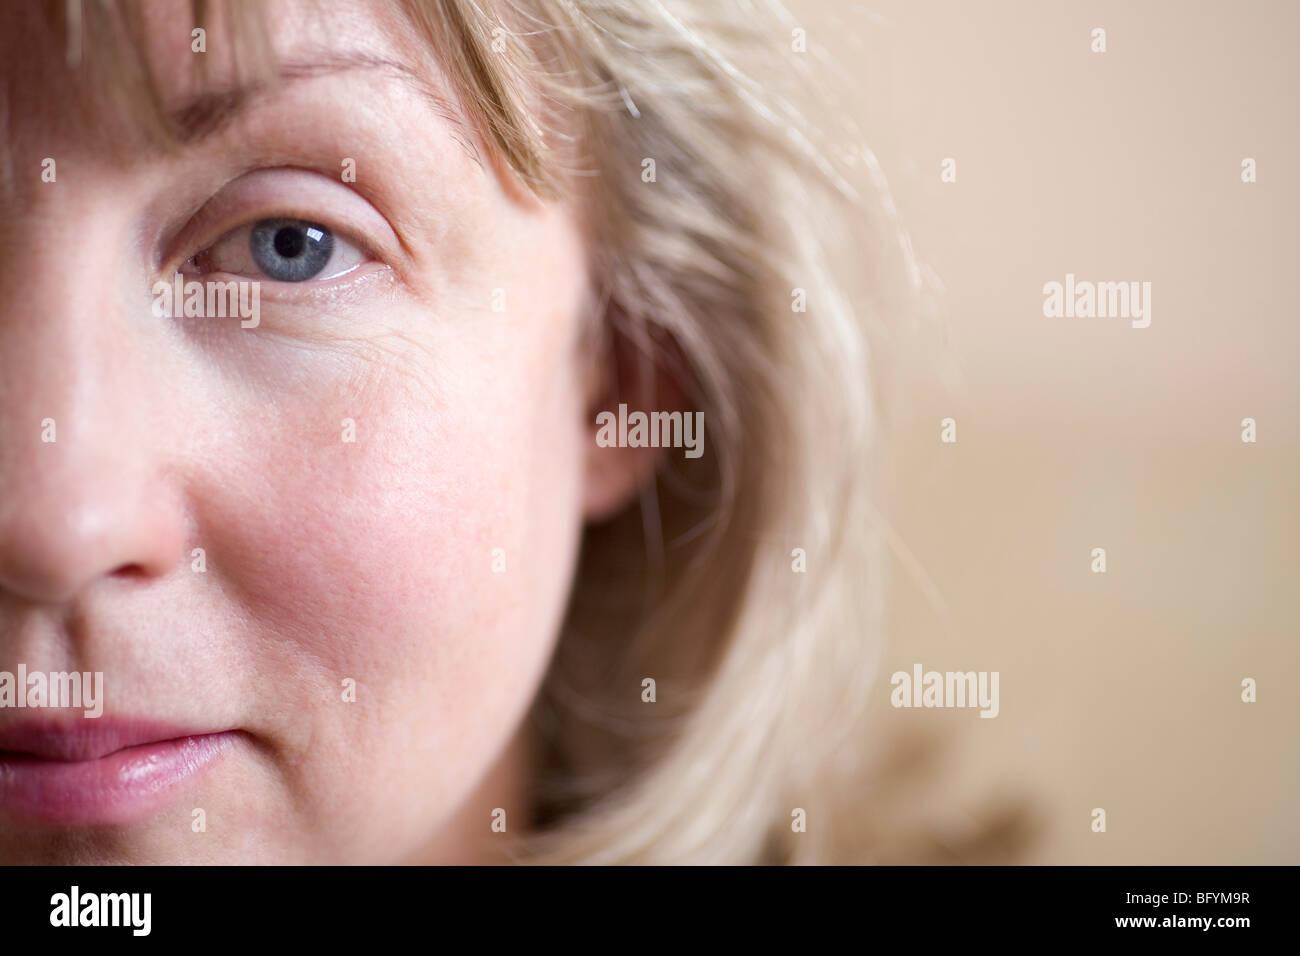 Nahaufnahme von Frau Blick in die Kamera Stockbild